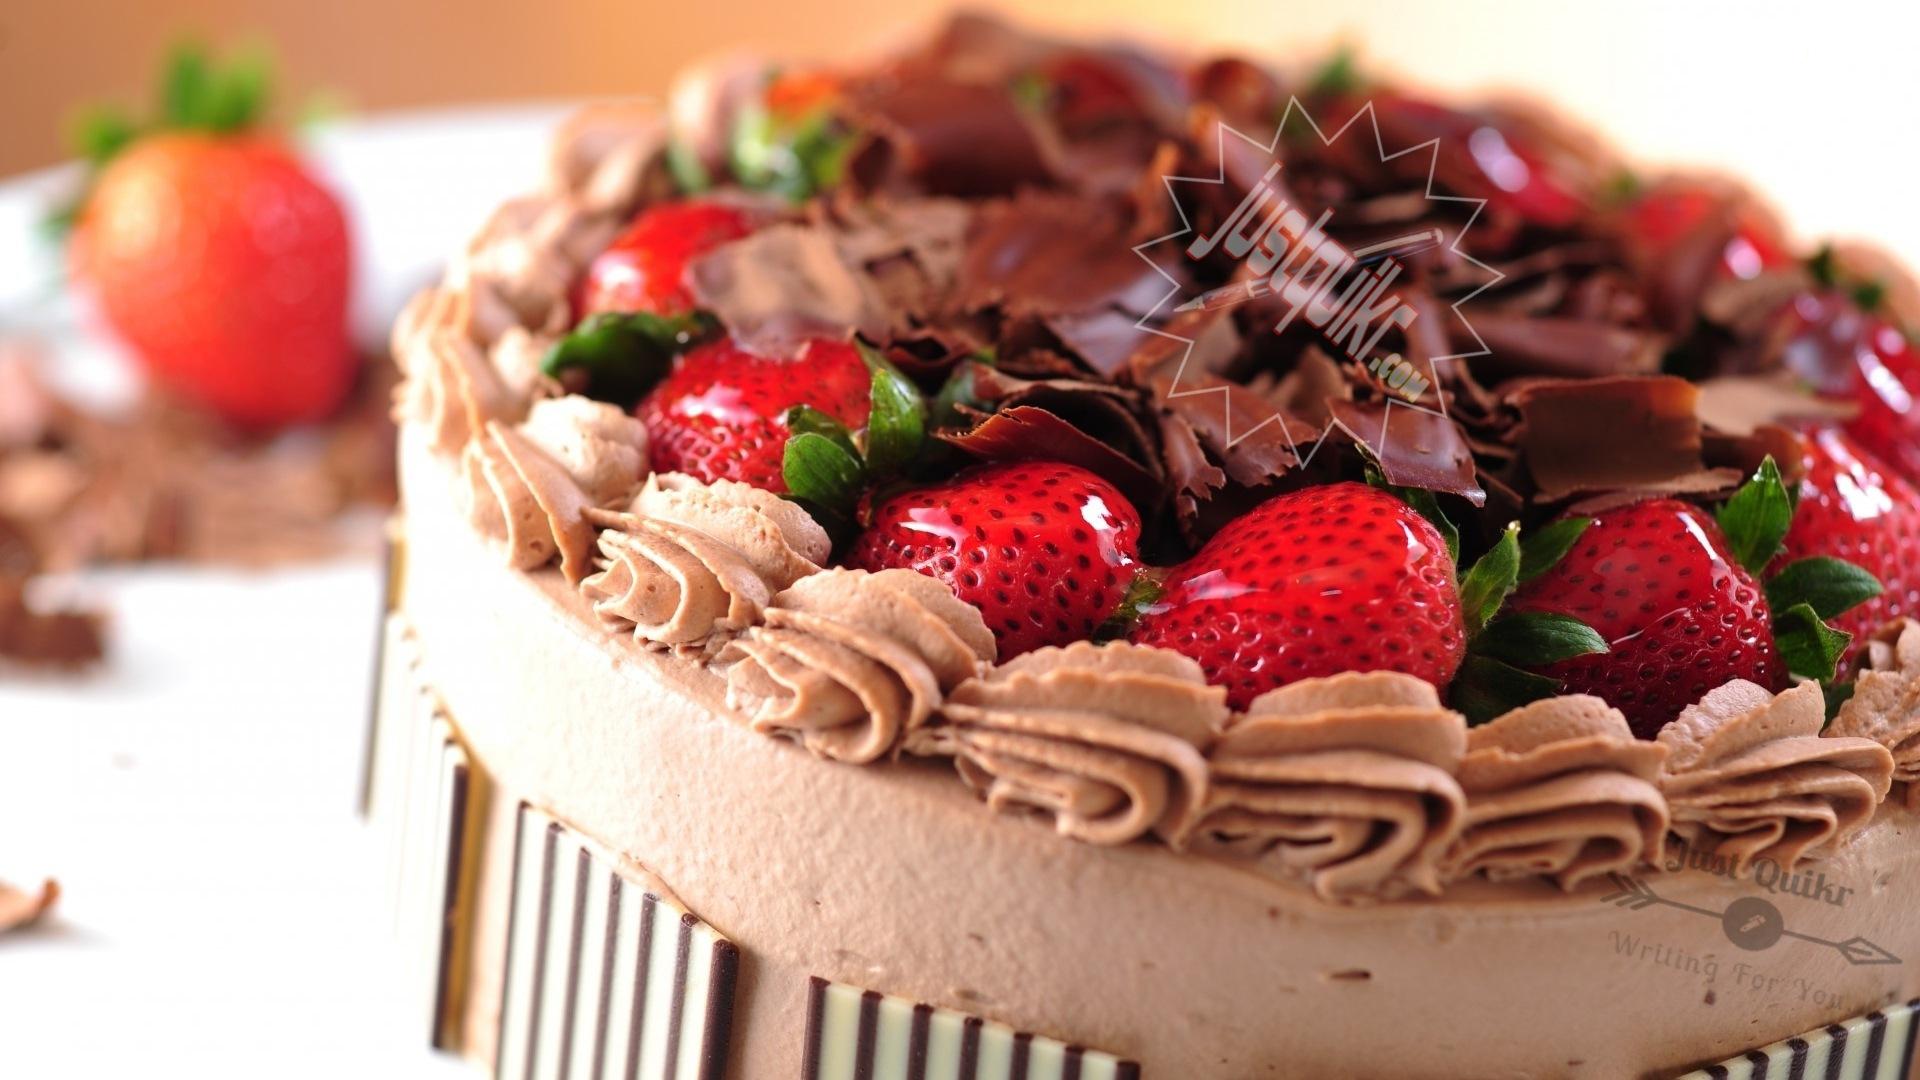 CreativeHappy Birthday Wishing Cake Status Images for Partner